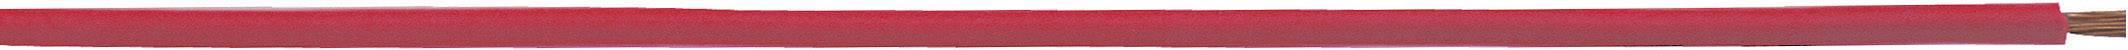 Opletenie / lanko LappKabel 4510032 H05V-K, 1 x 0.75 mm², vonkajší Ø 2.40 mm, 100 m, hnedá